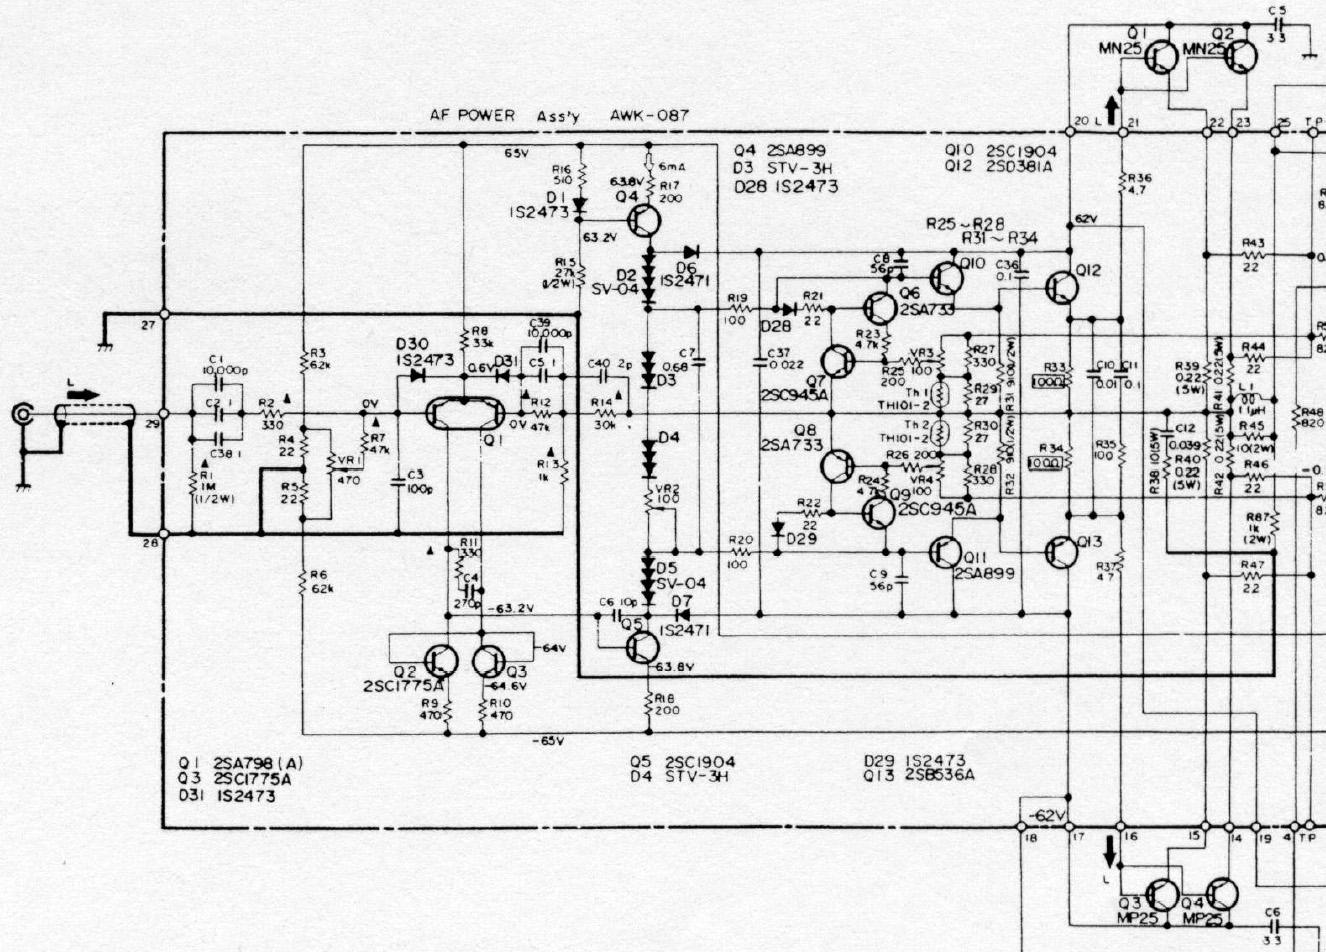 GUERRA CIVIL JAPONESA DEL AUDIO (70,s 80,s) - Página 13 M25_schematic